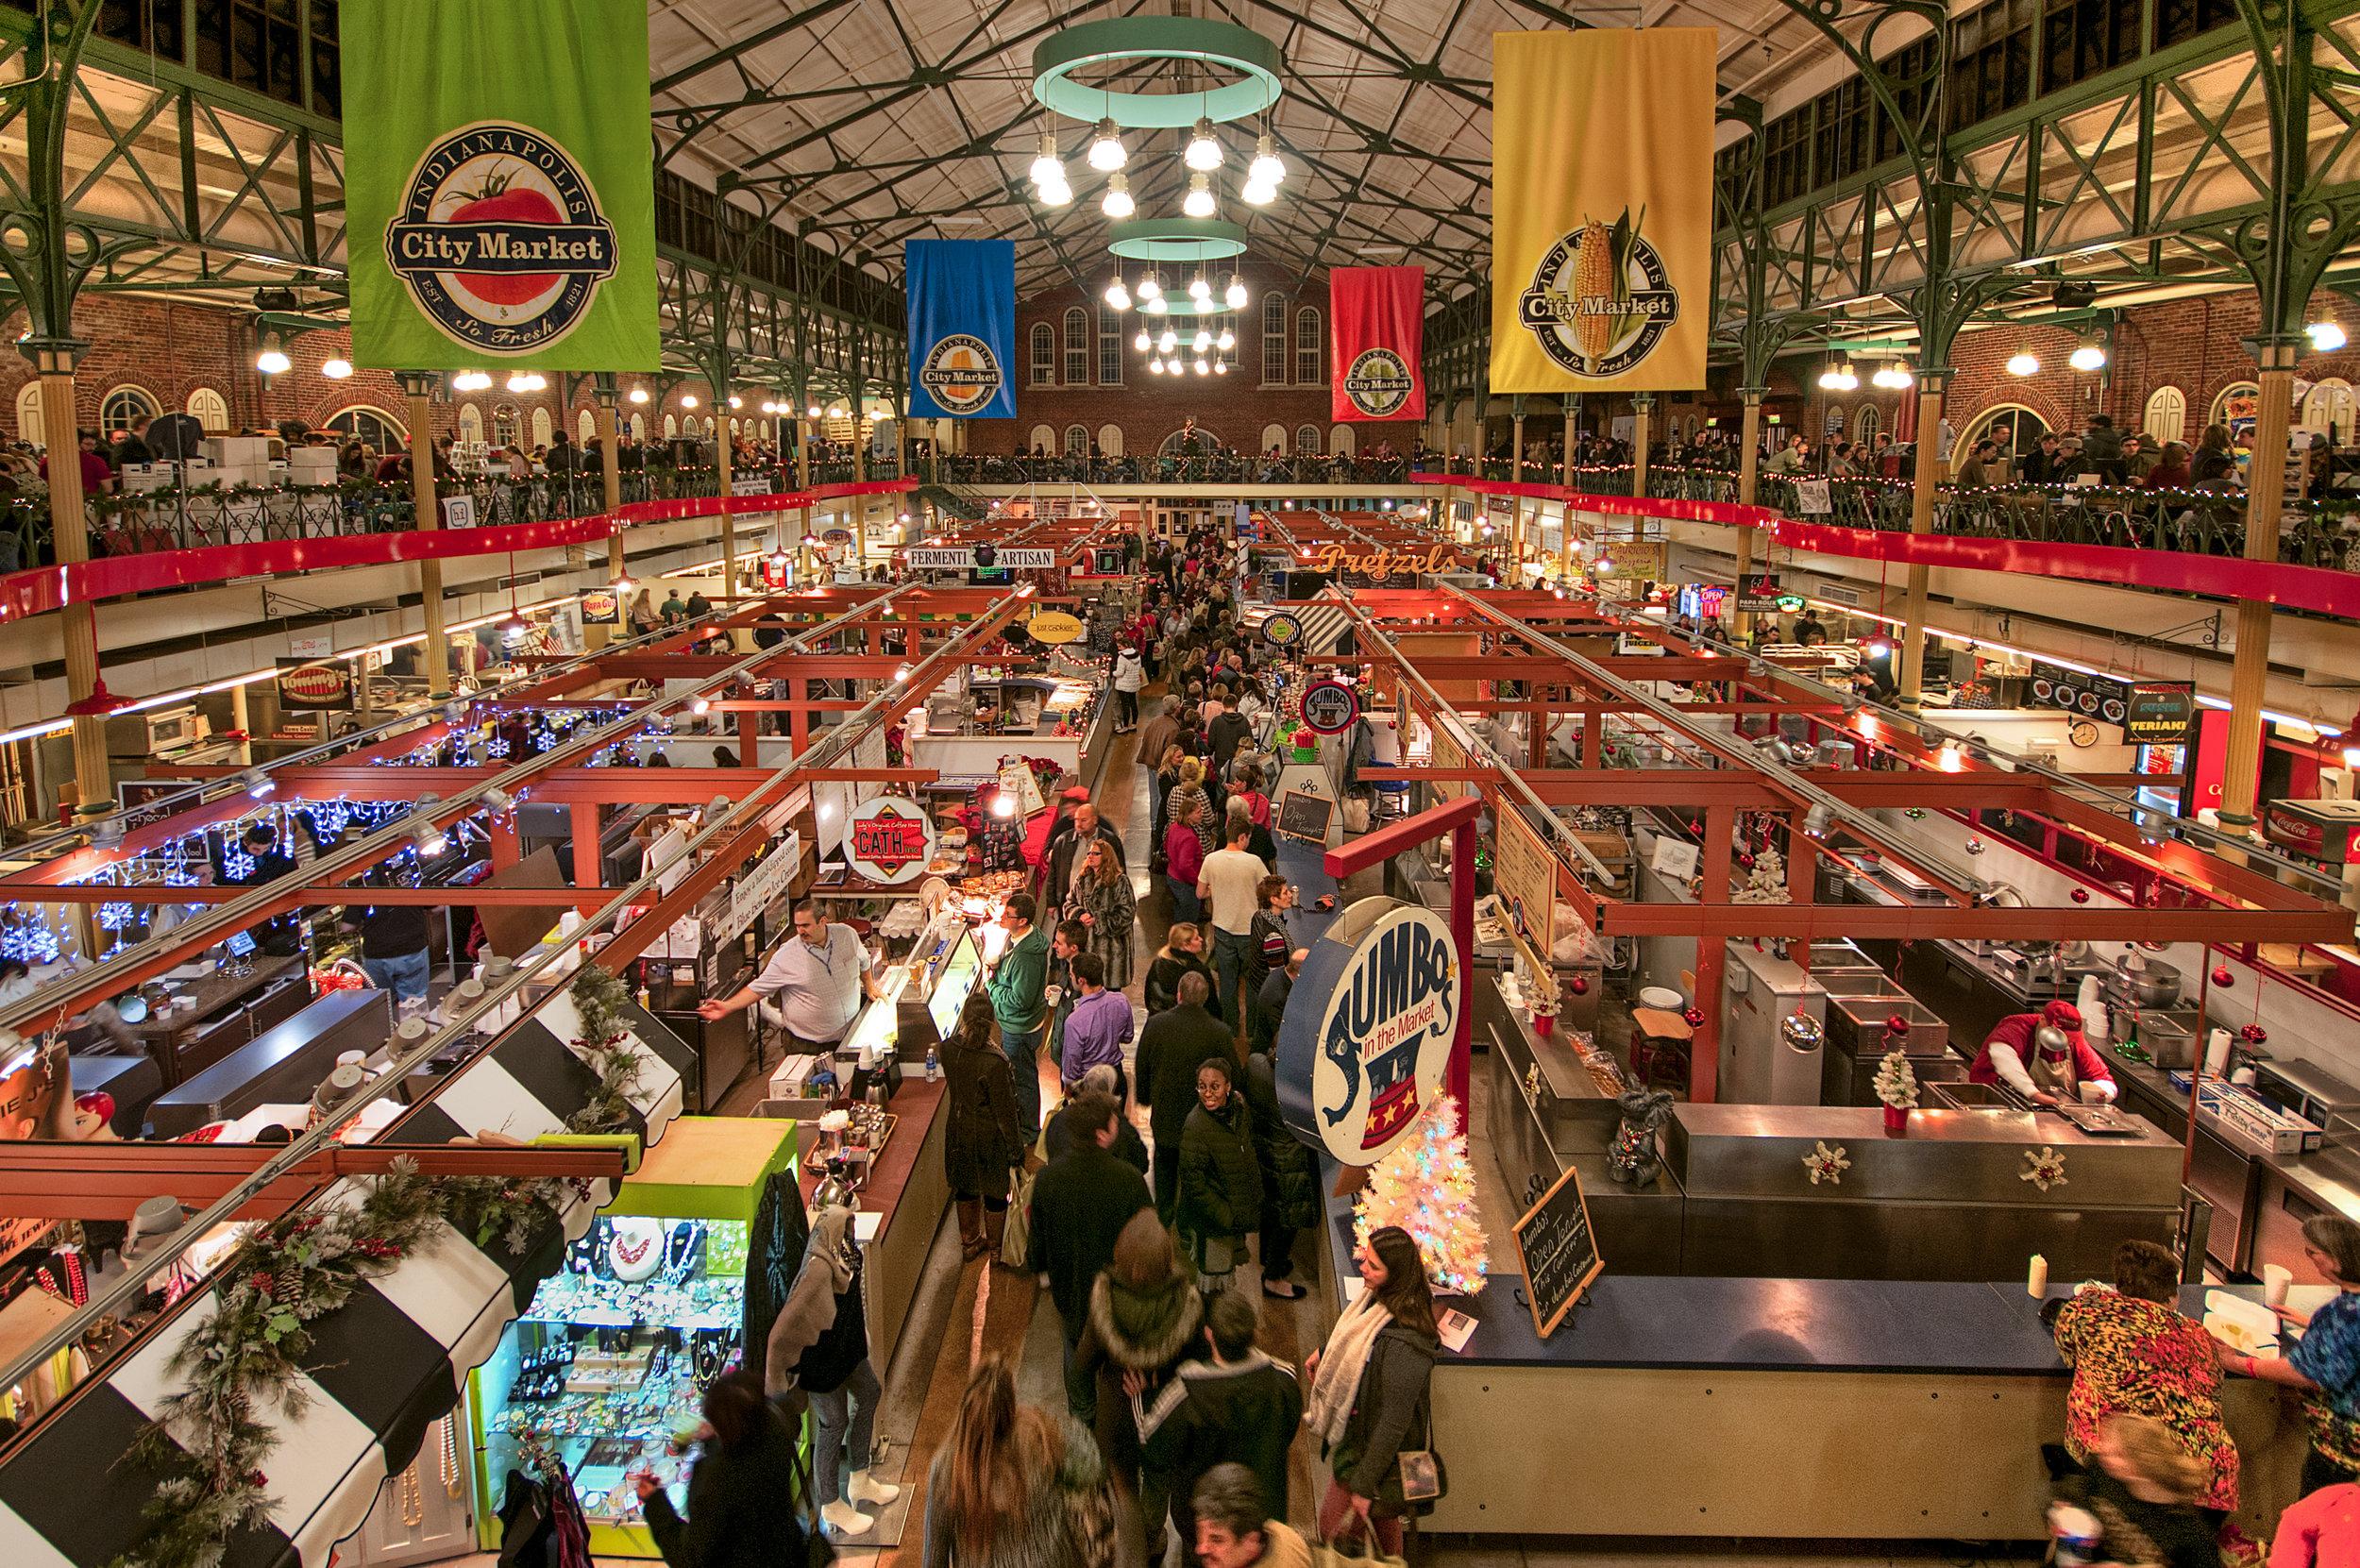 VisitIndy-City-Market-006.jpg